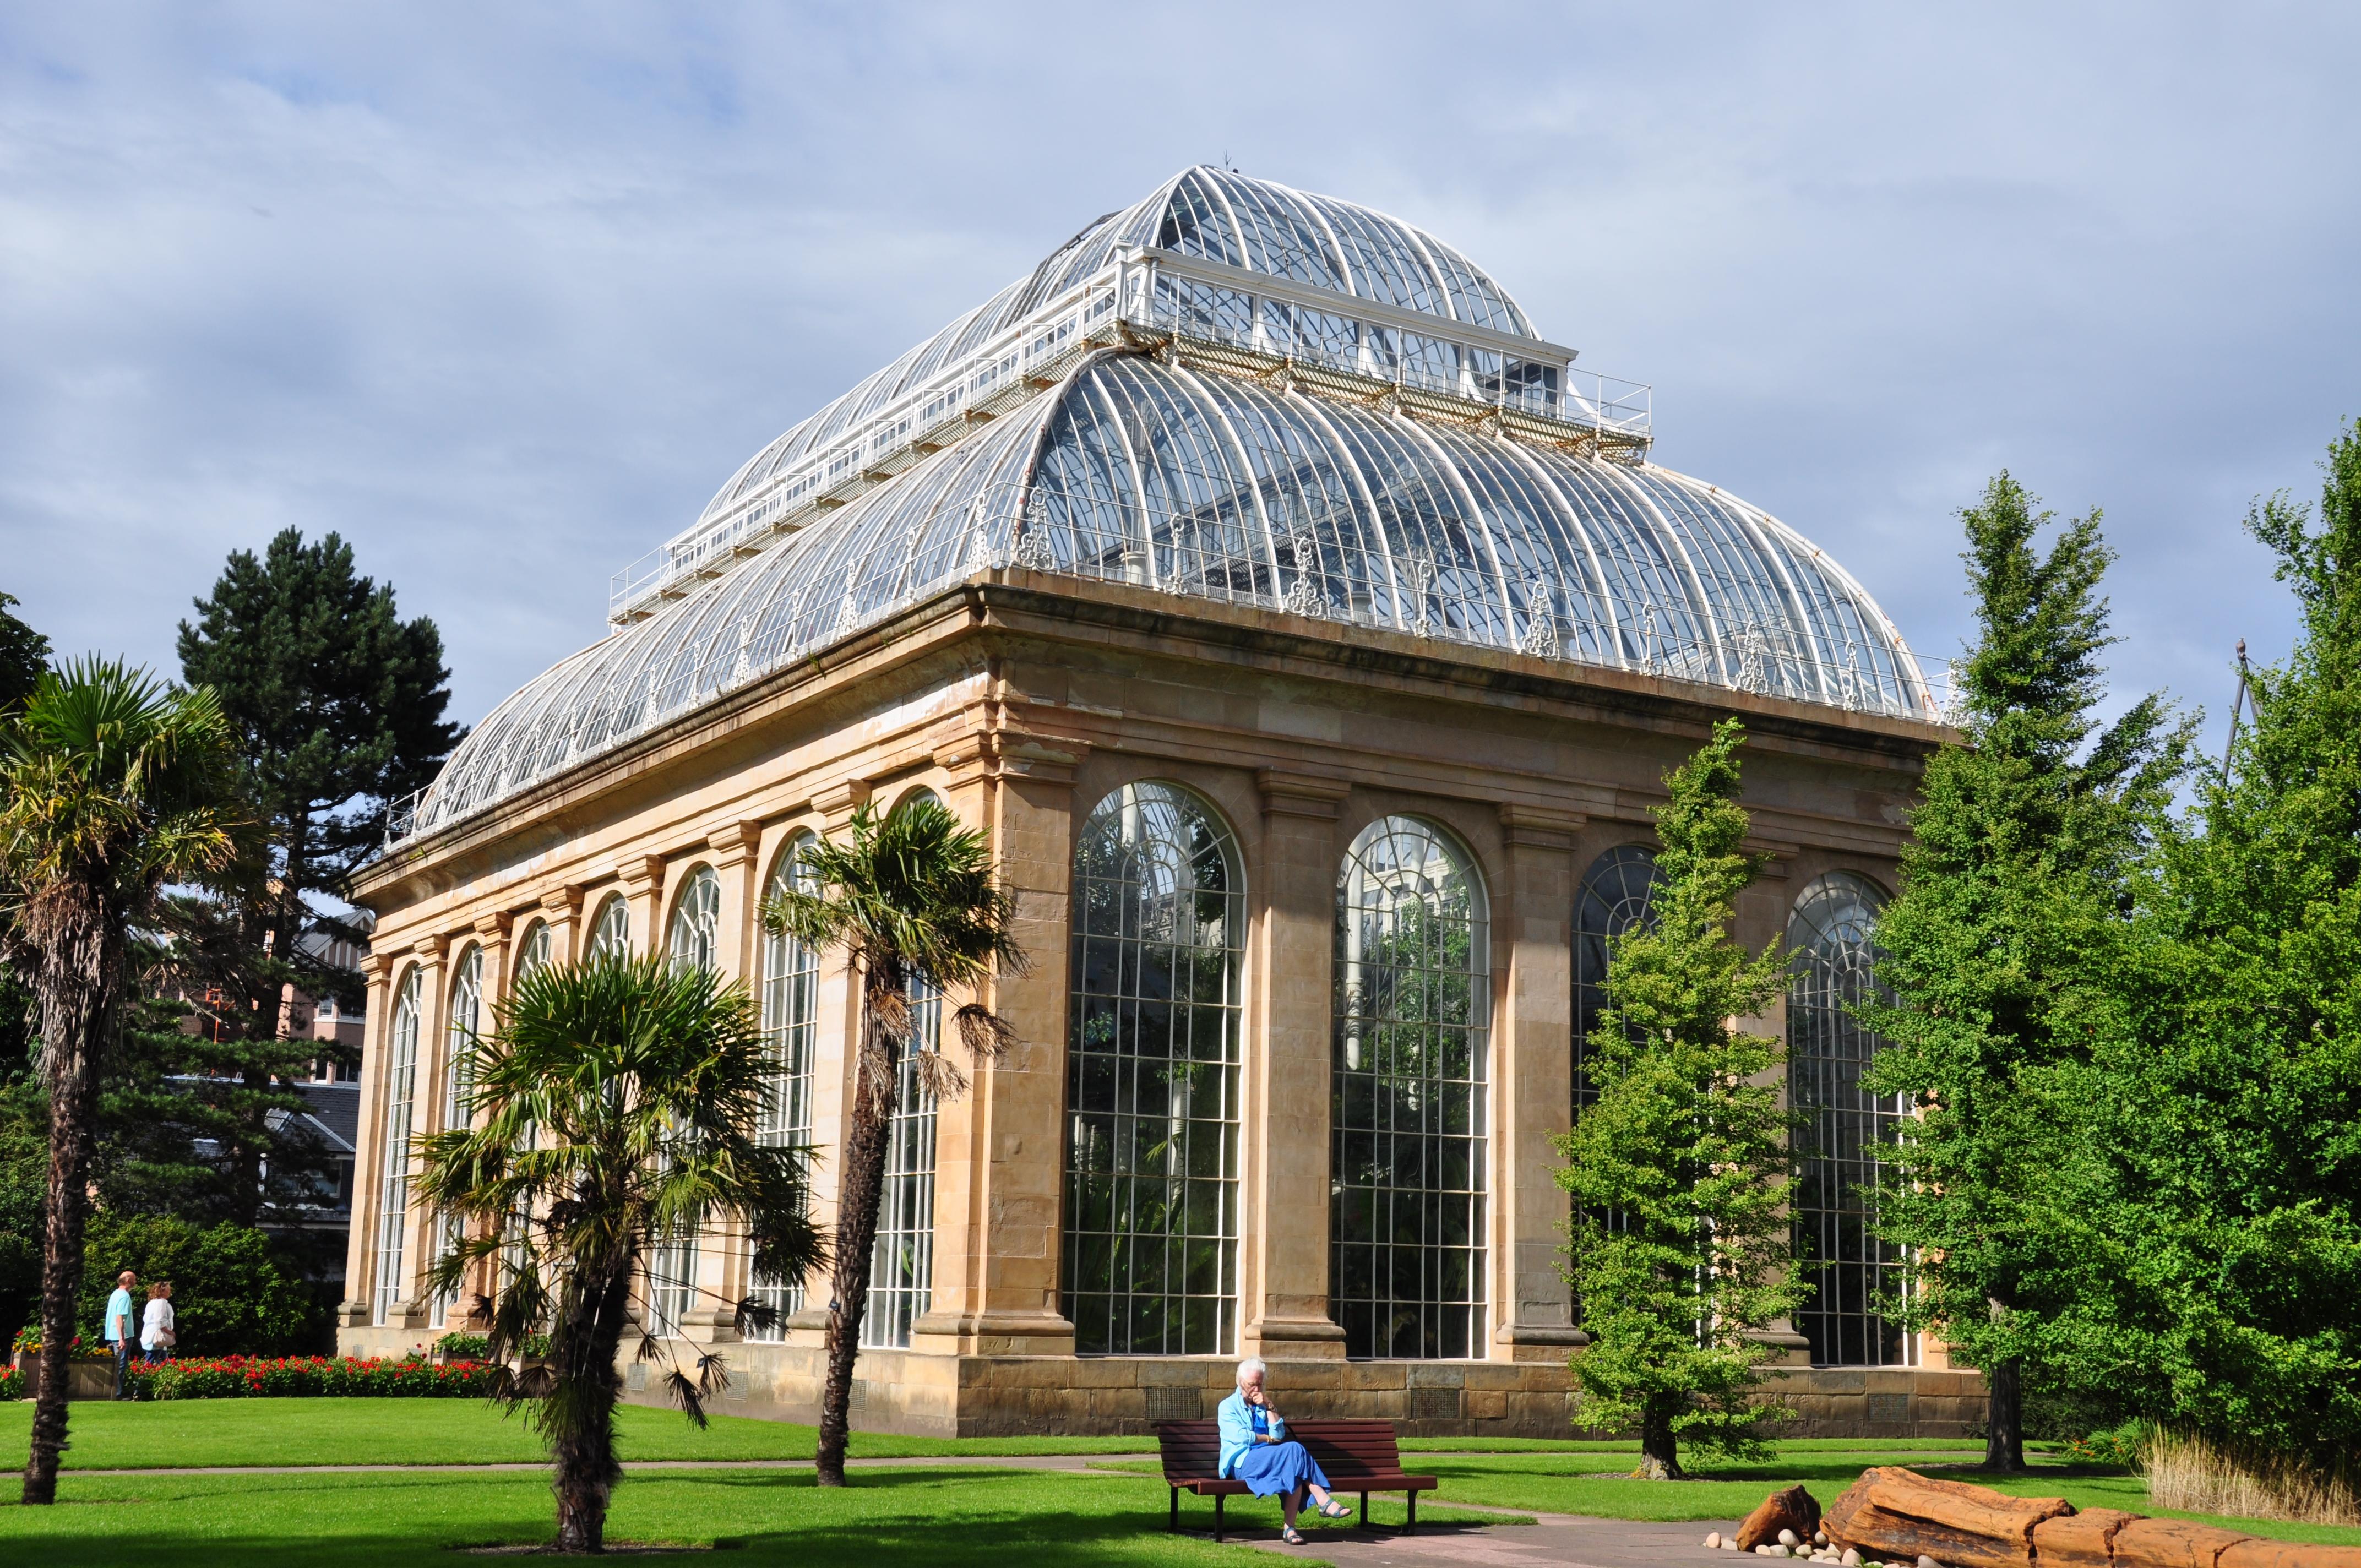 File Greenhouse At The Royal Botanic Garden Of Edinburgh Jpg Wikimedia Commons